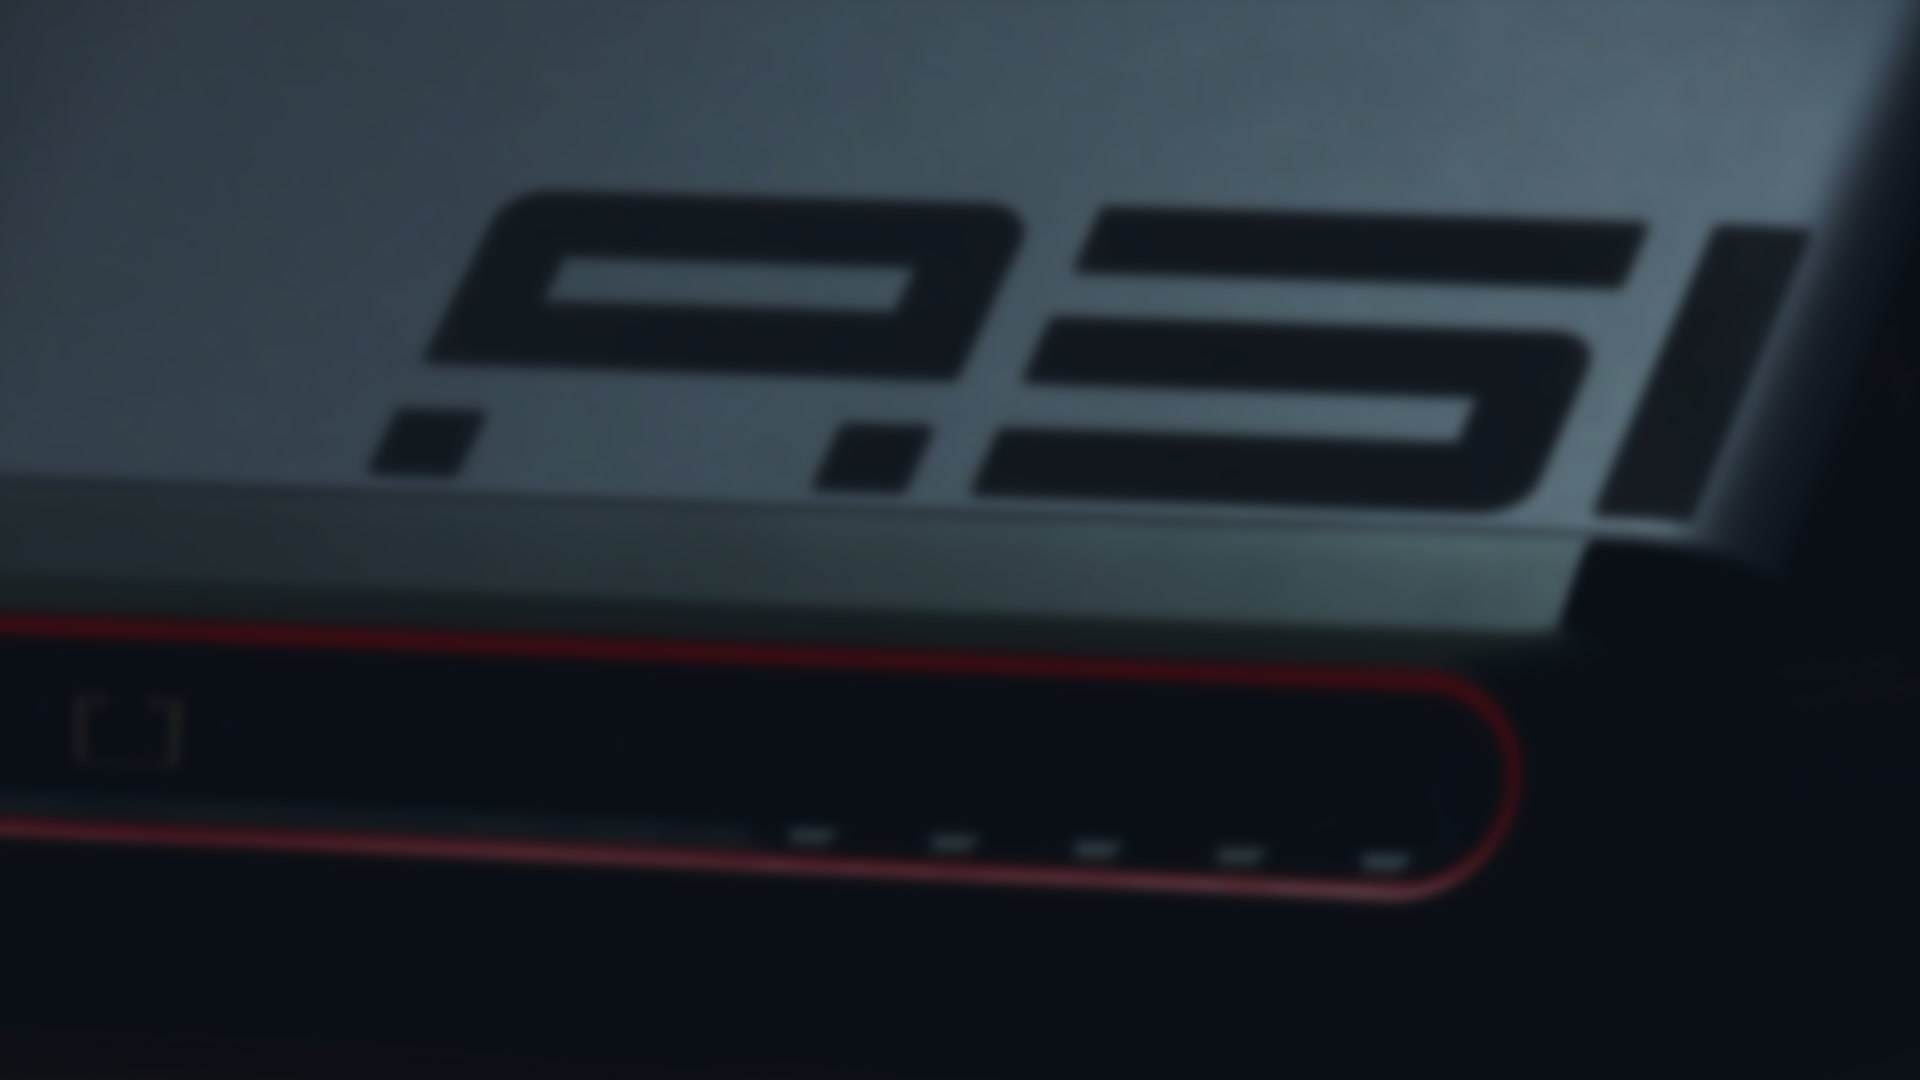 👽 Alienware Area 51m Review 😍 [Part 2] ULTIMATE Desktop Setup Best Gaming Laptop 2019